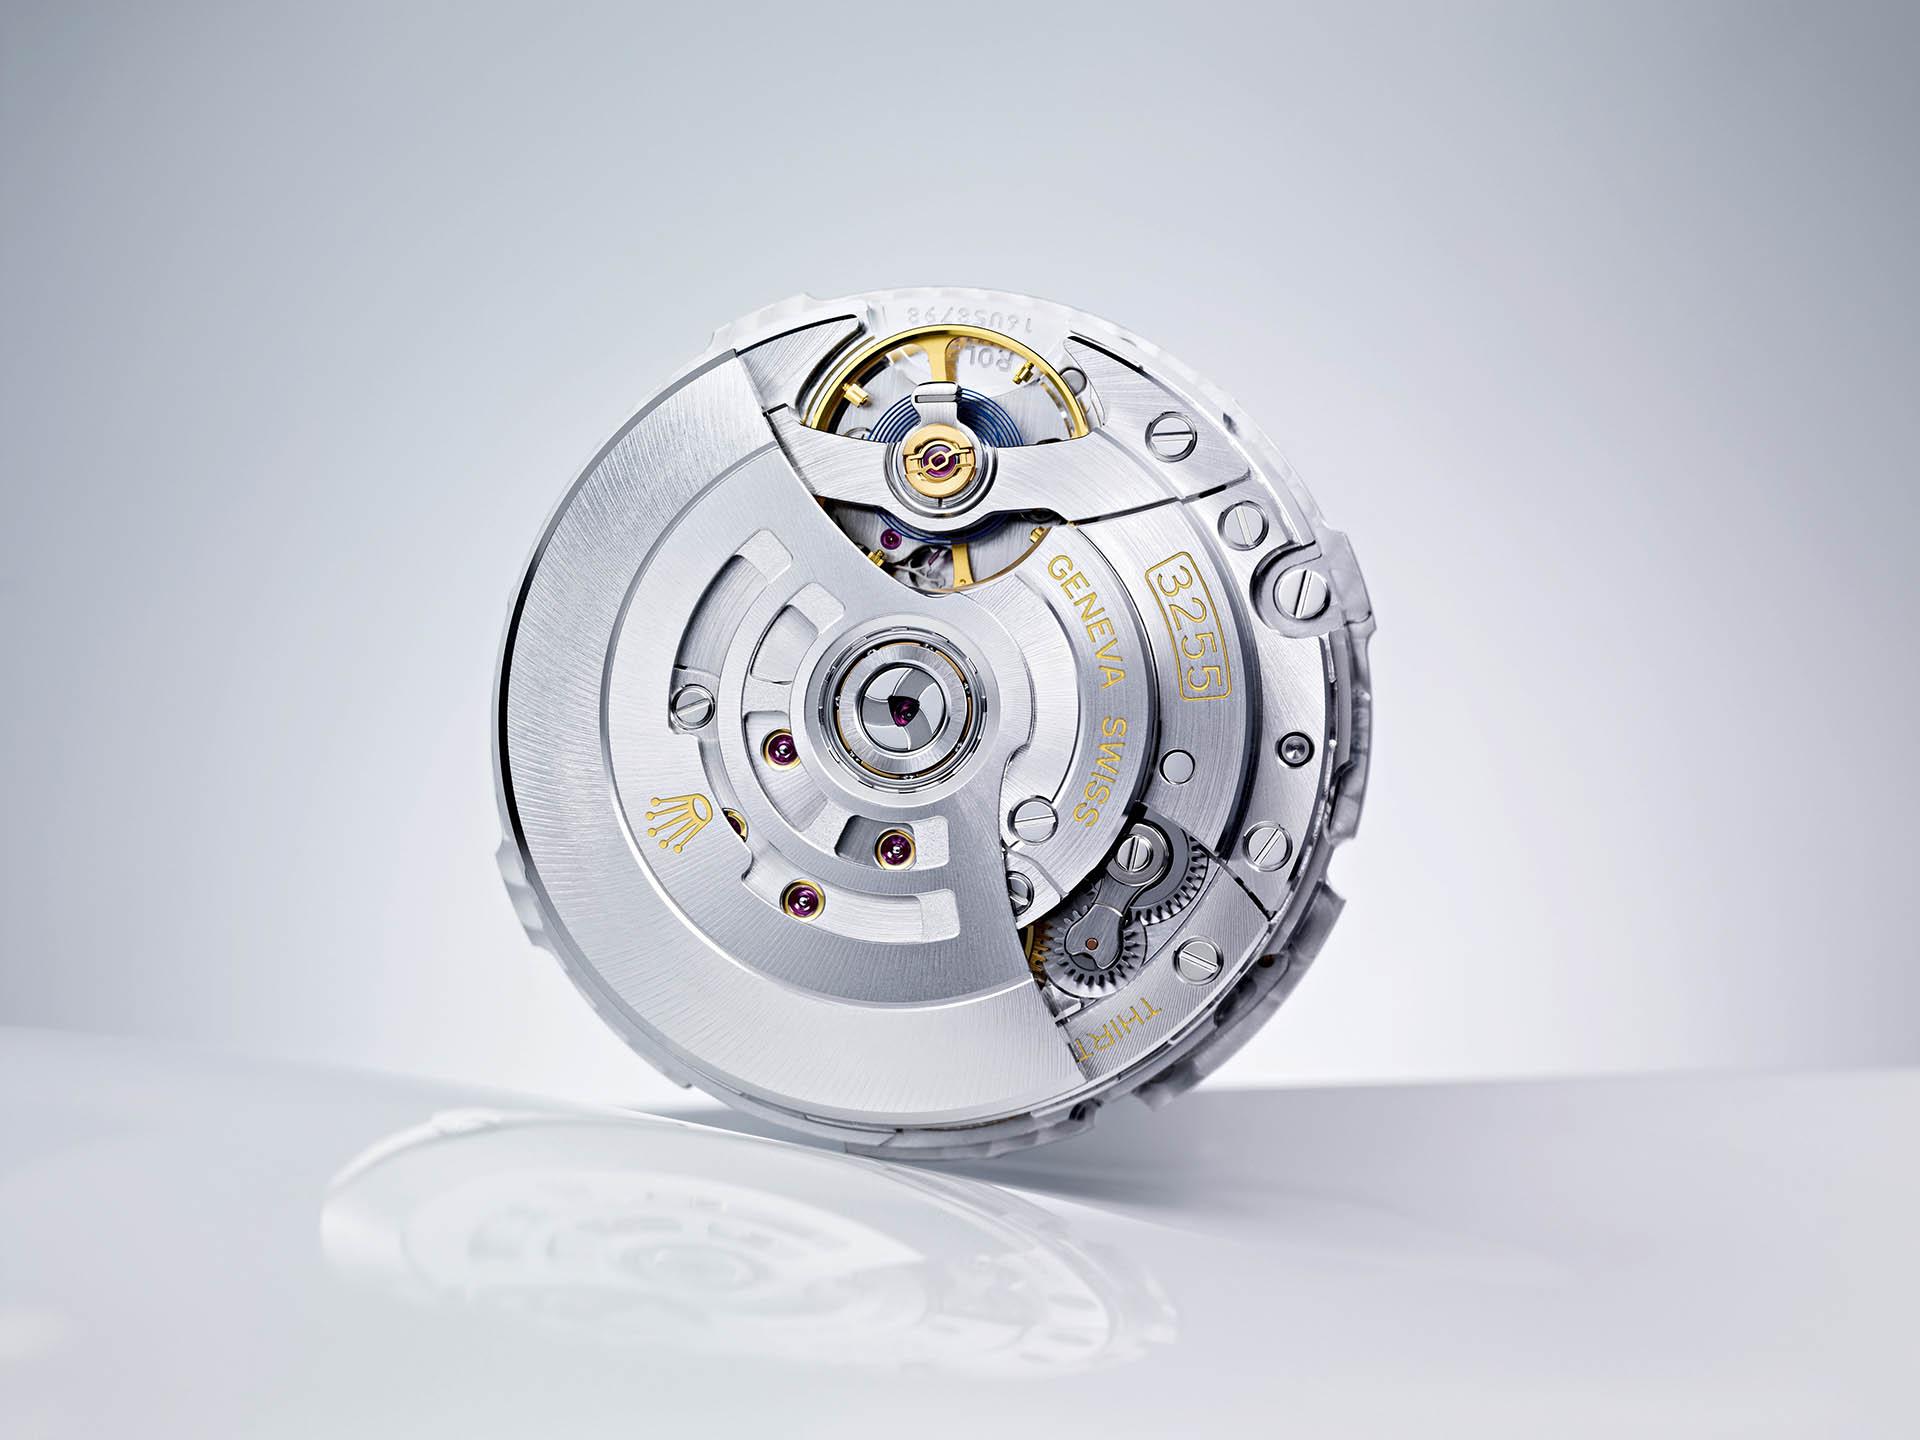 Das Rolex Kaliber 3255